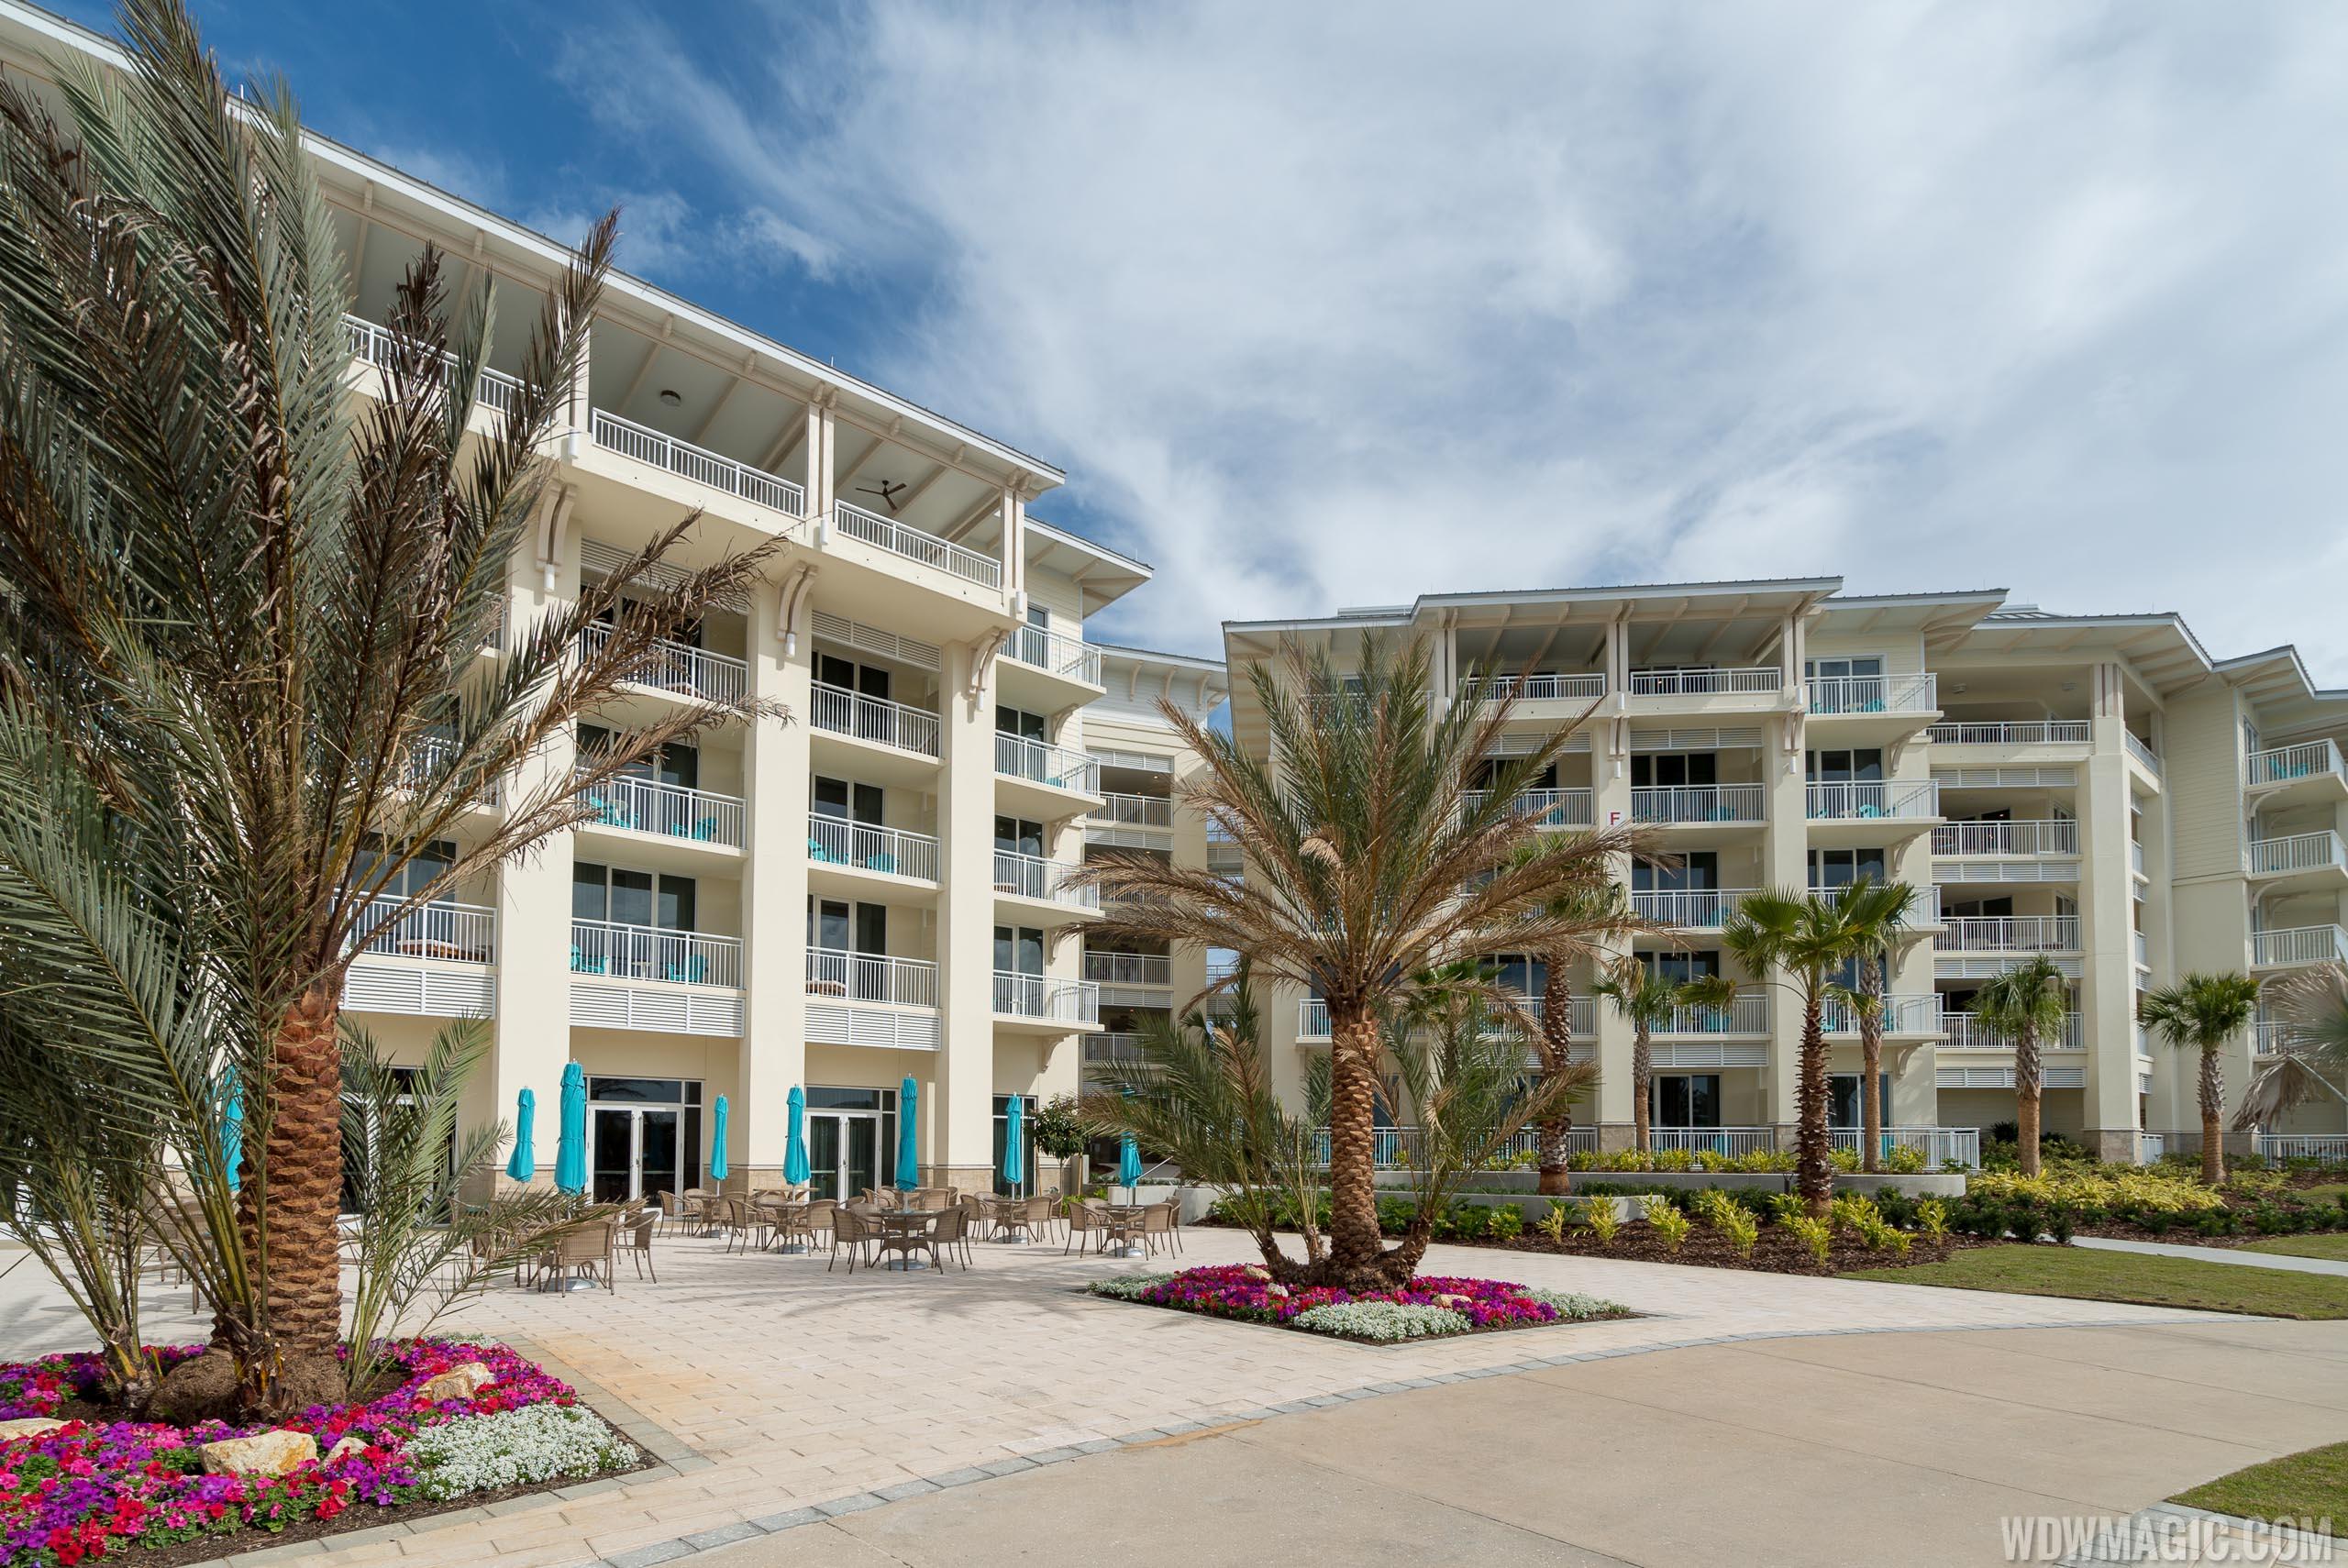 PHOTOS - Tour the brand new Margaritaville Resort Orlando